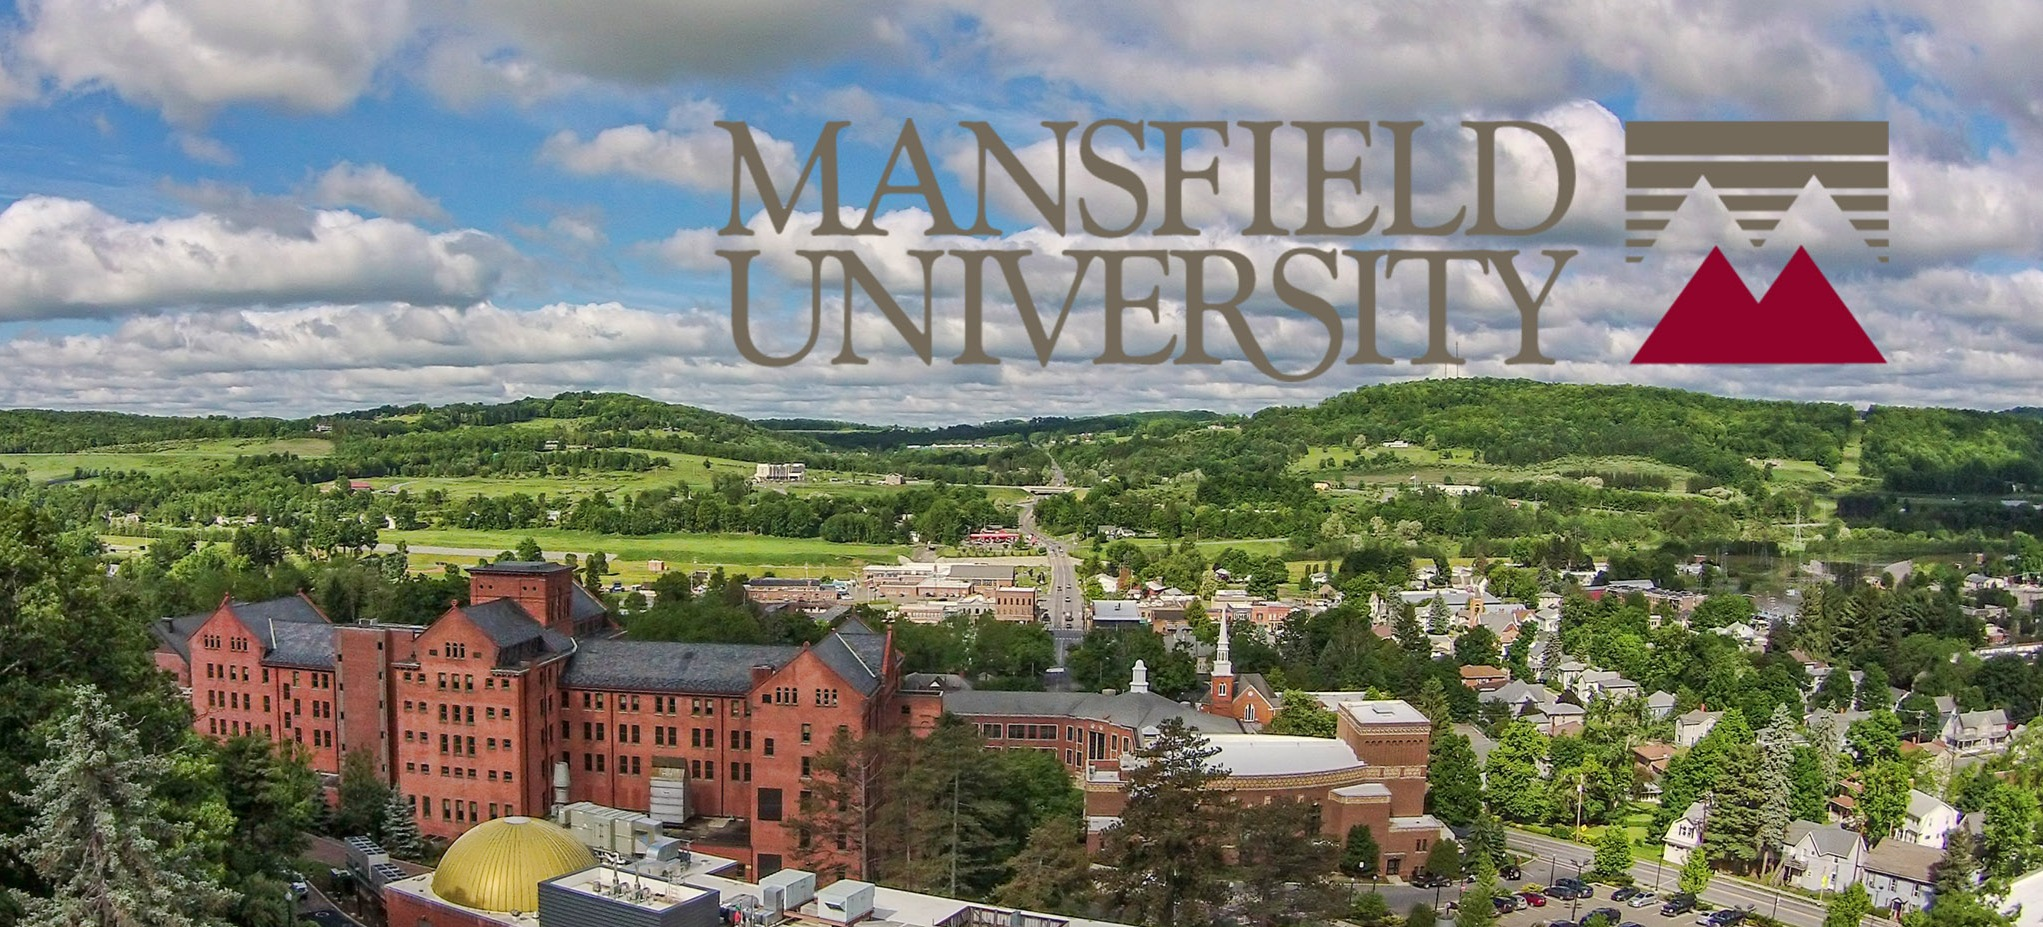 Mansfield_edited